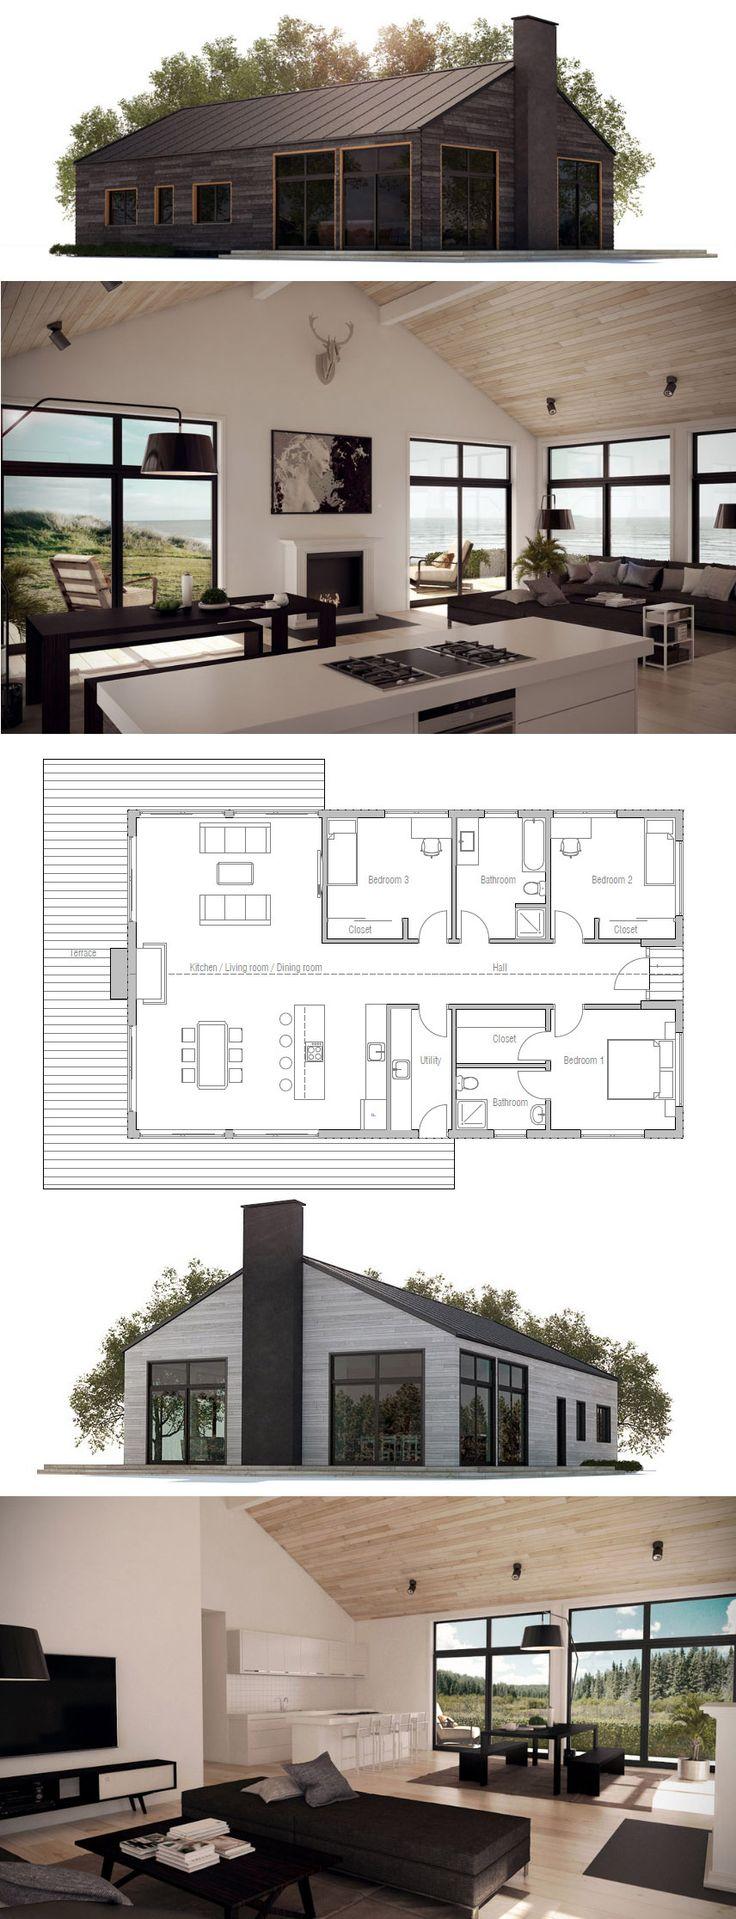 House Plan CH232